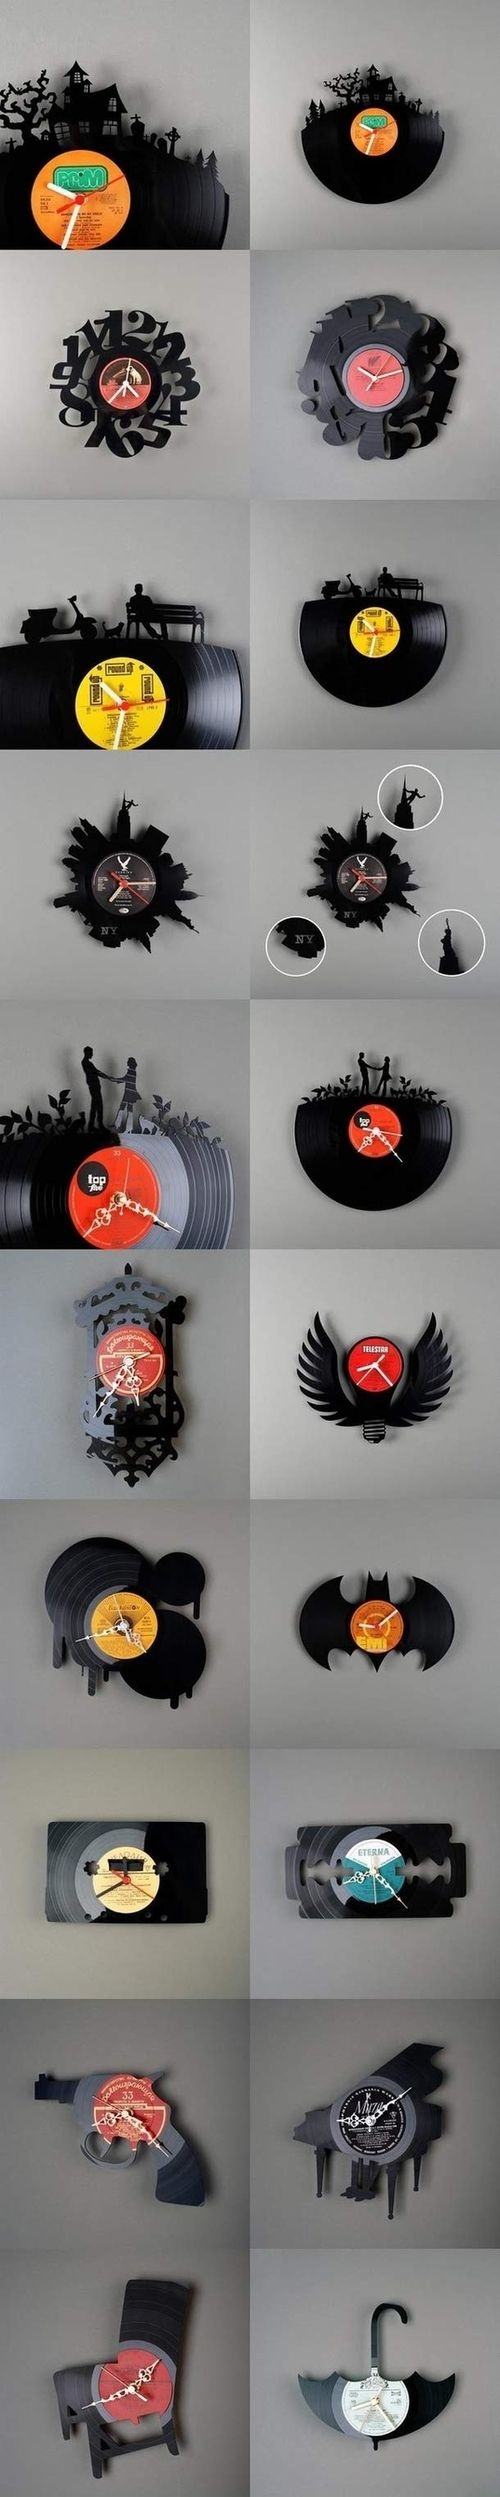 recycled vinyl records5